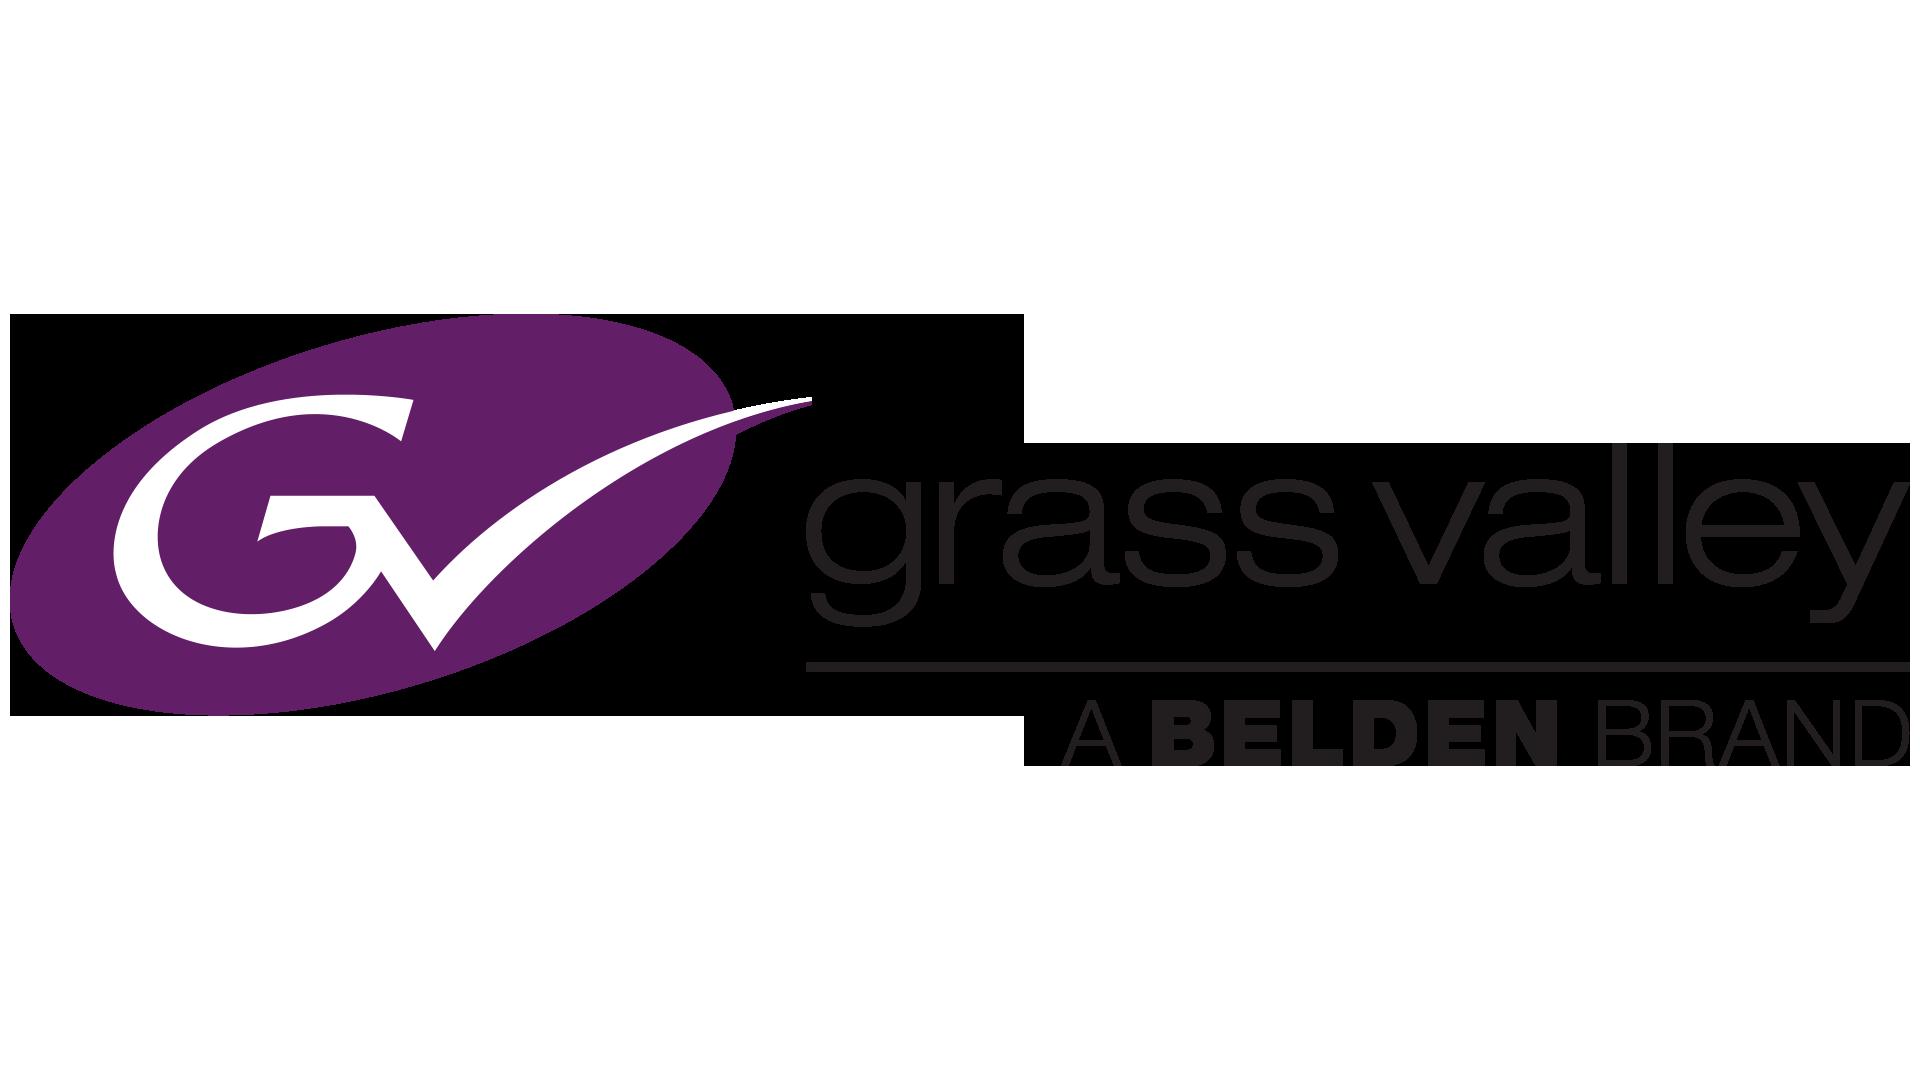 Grass-Valley-Belden